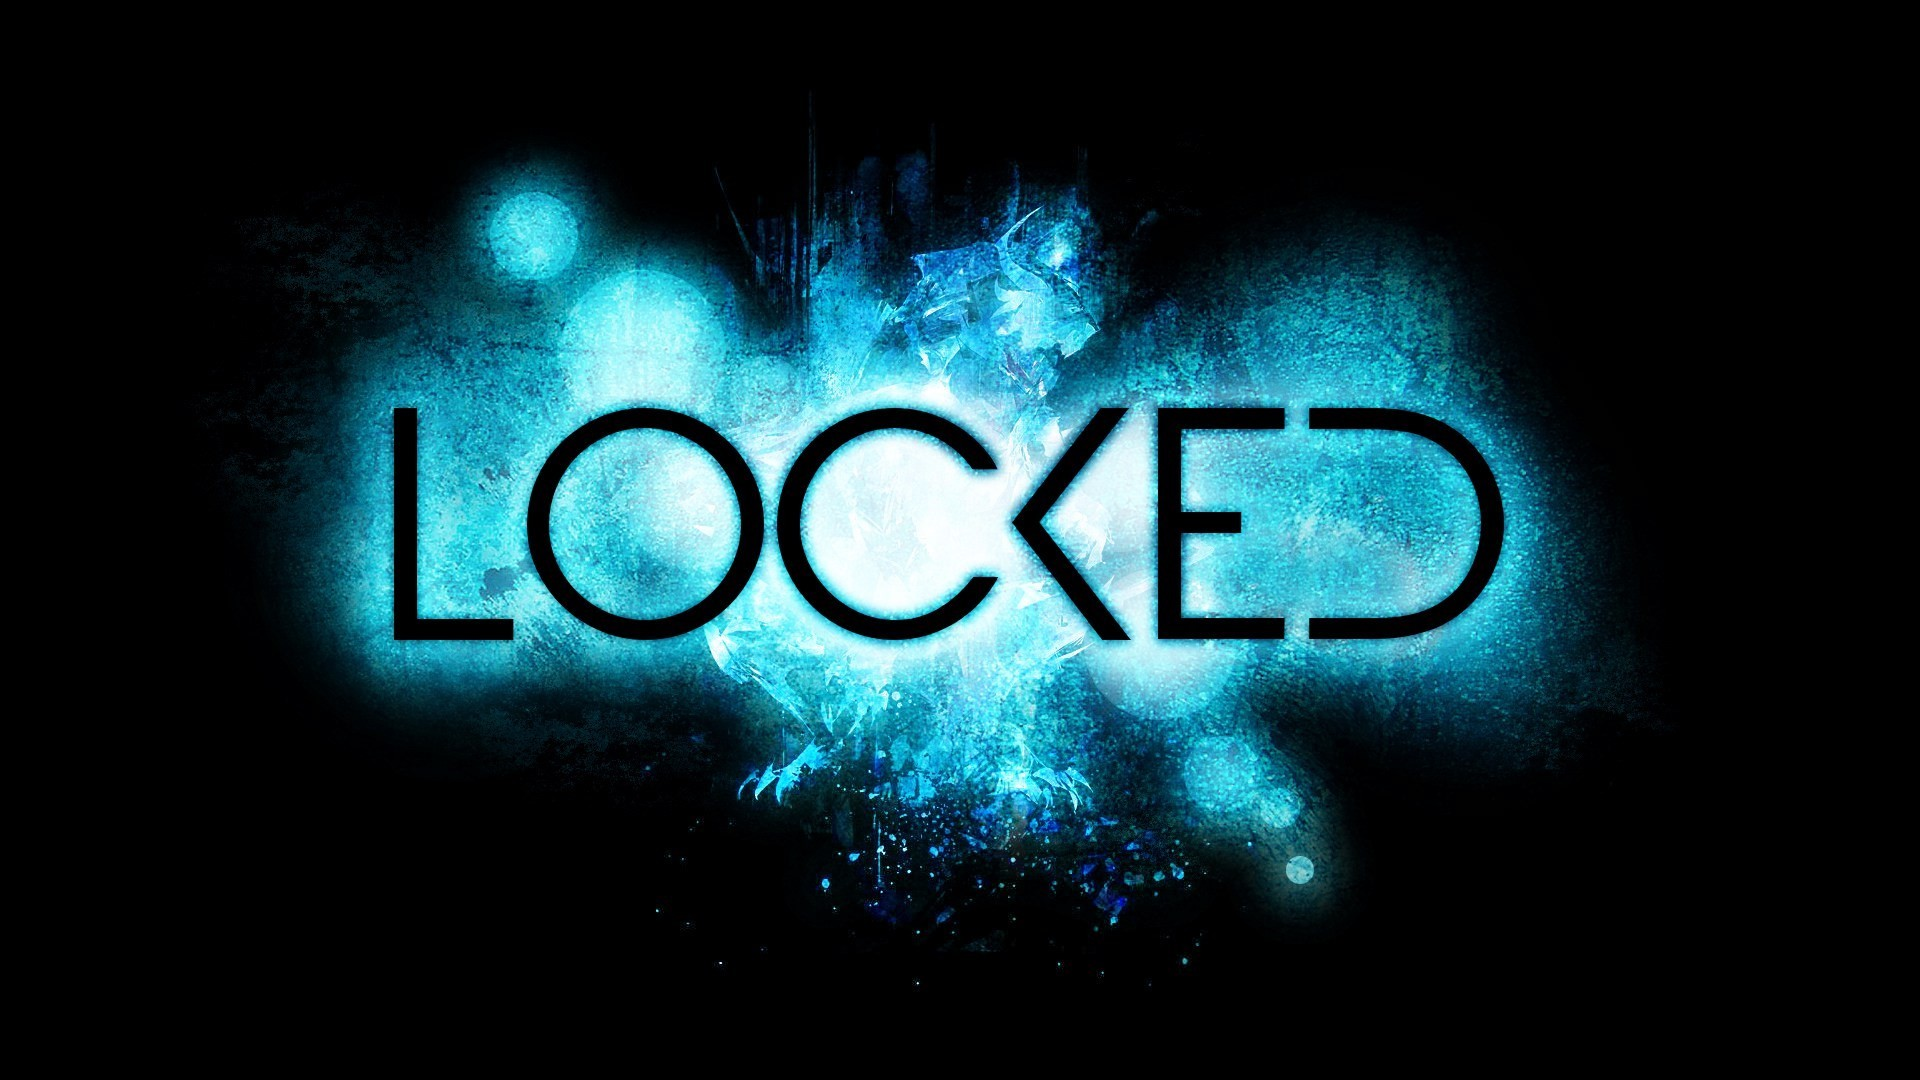 Funny Lock Screen Wallpaper 74 Images